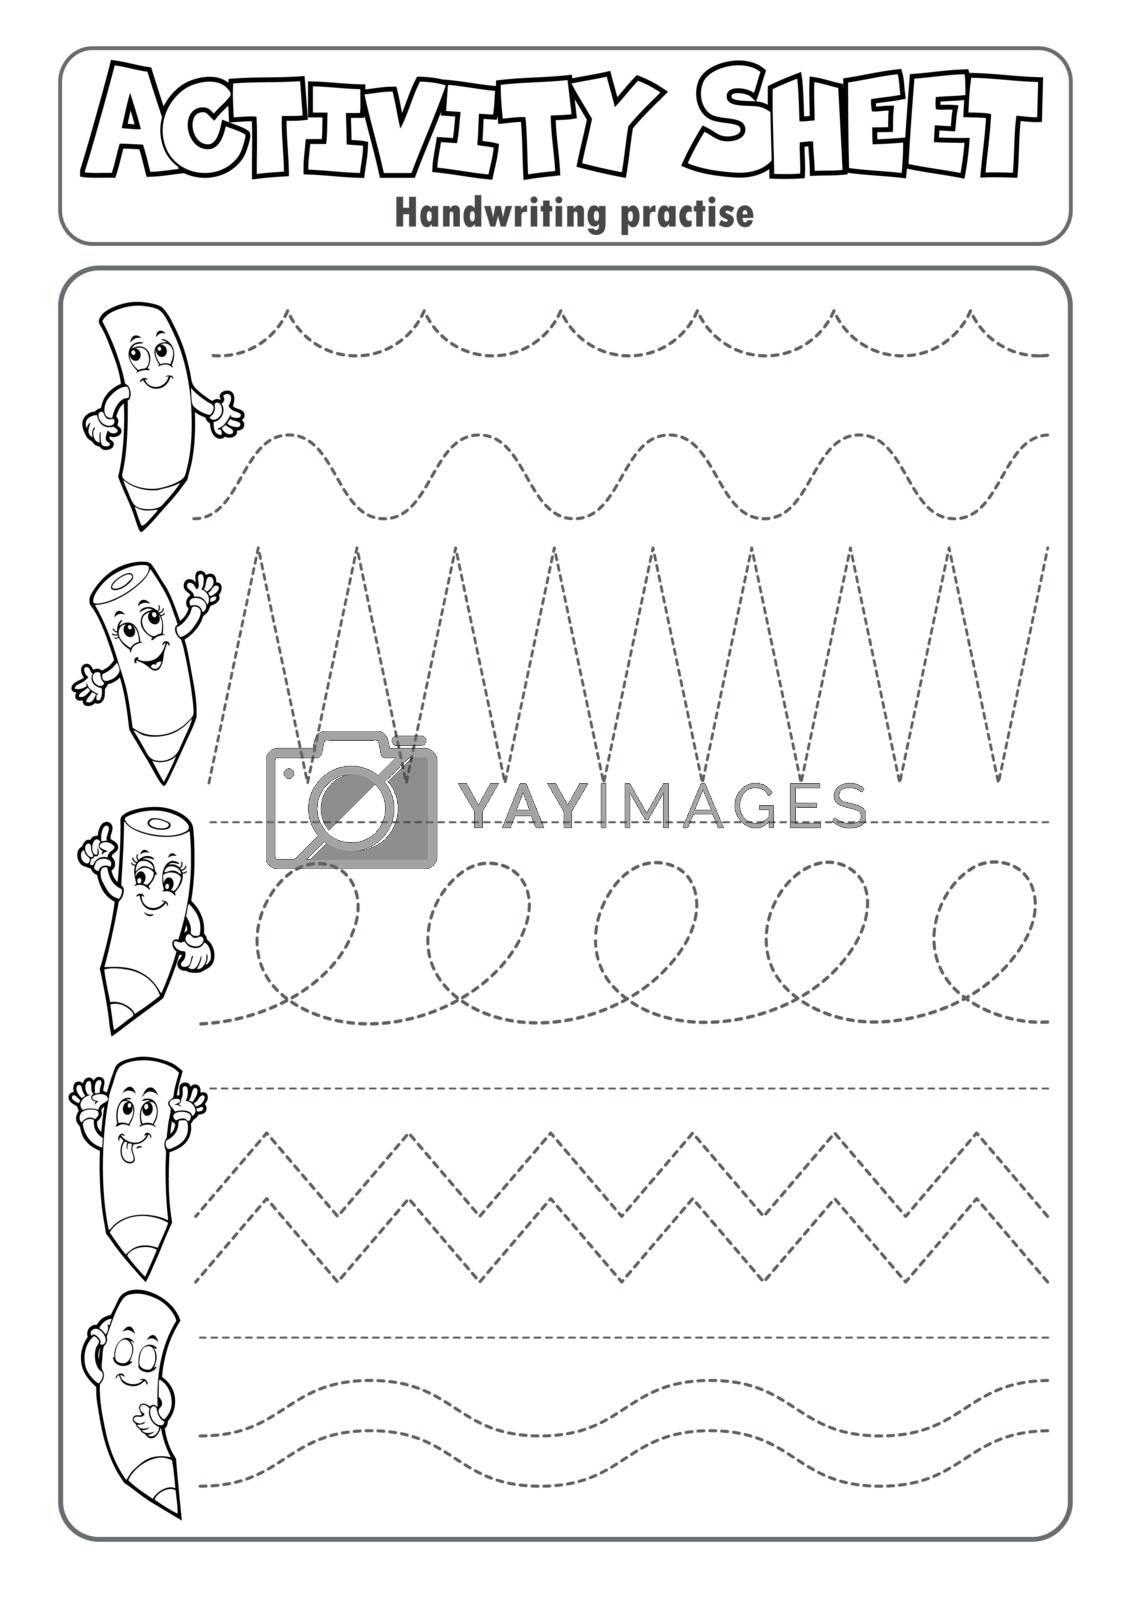 Activity sheet handwriting practise 2 - eps10 vector illustration.